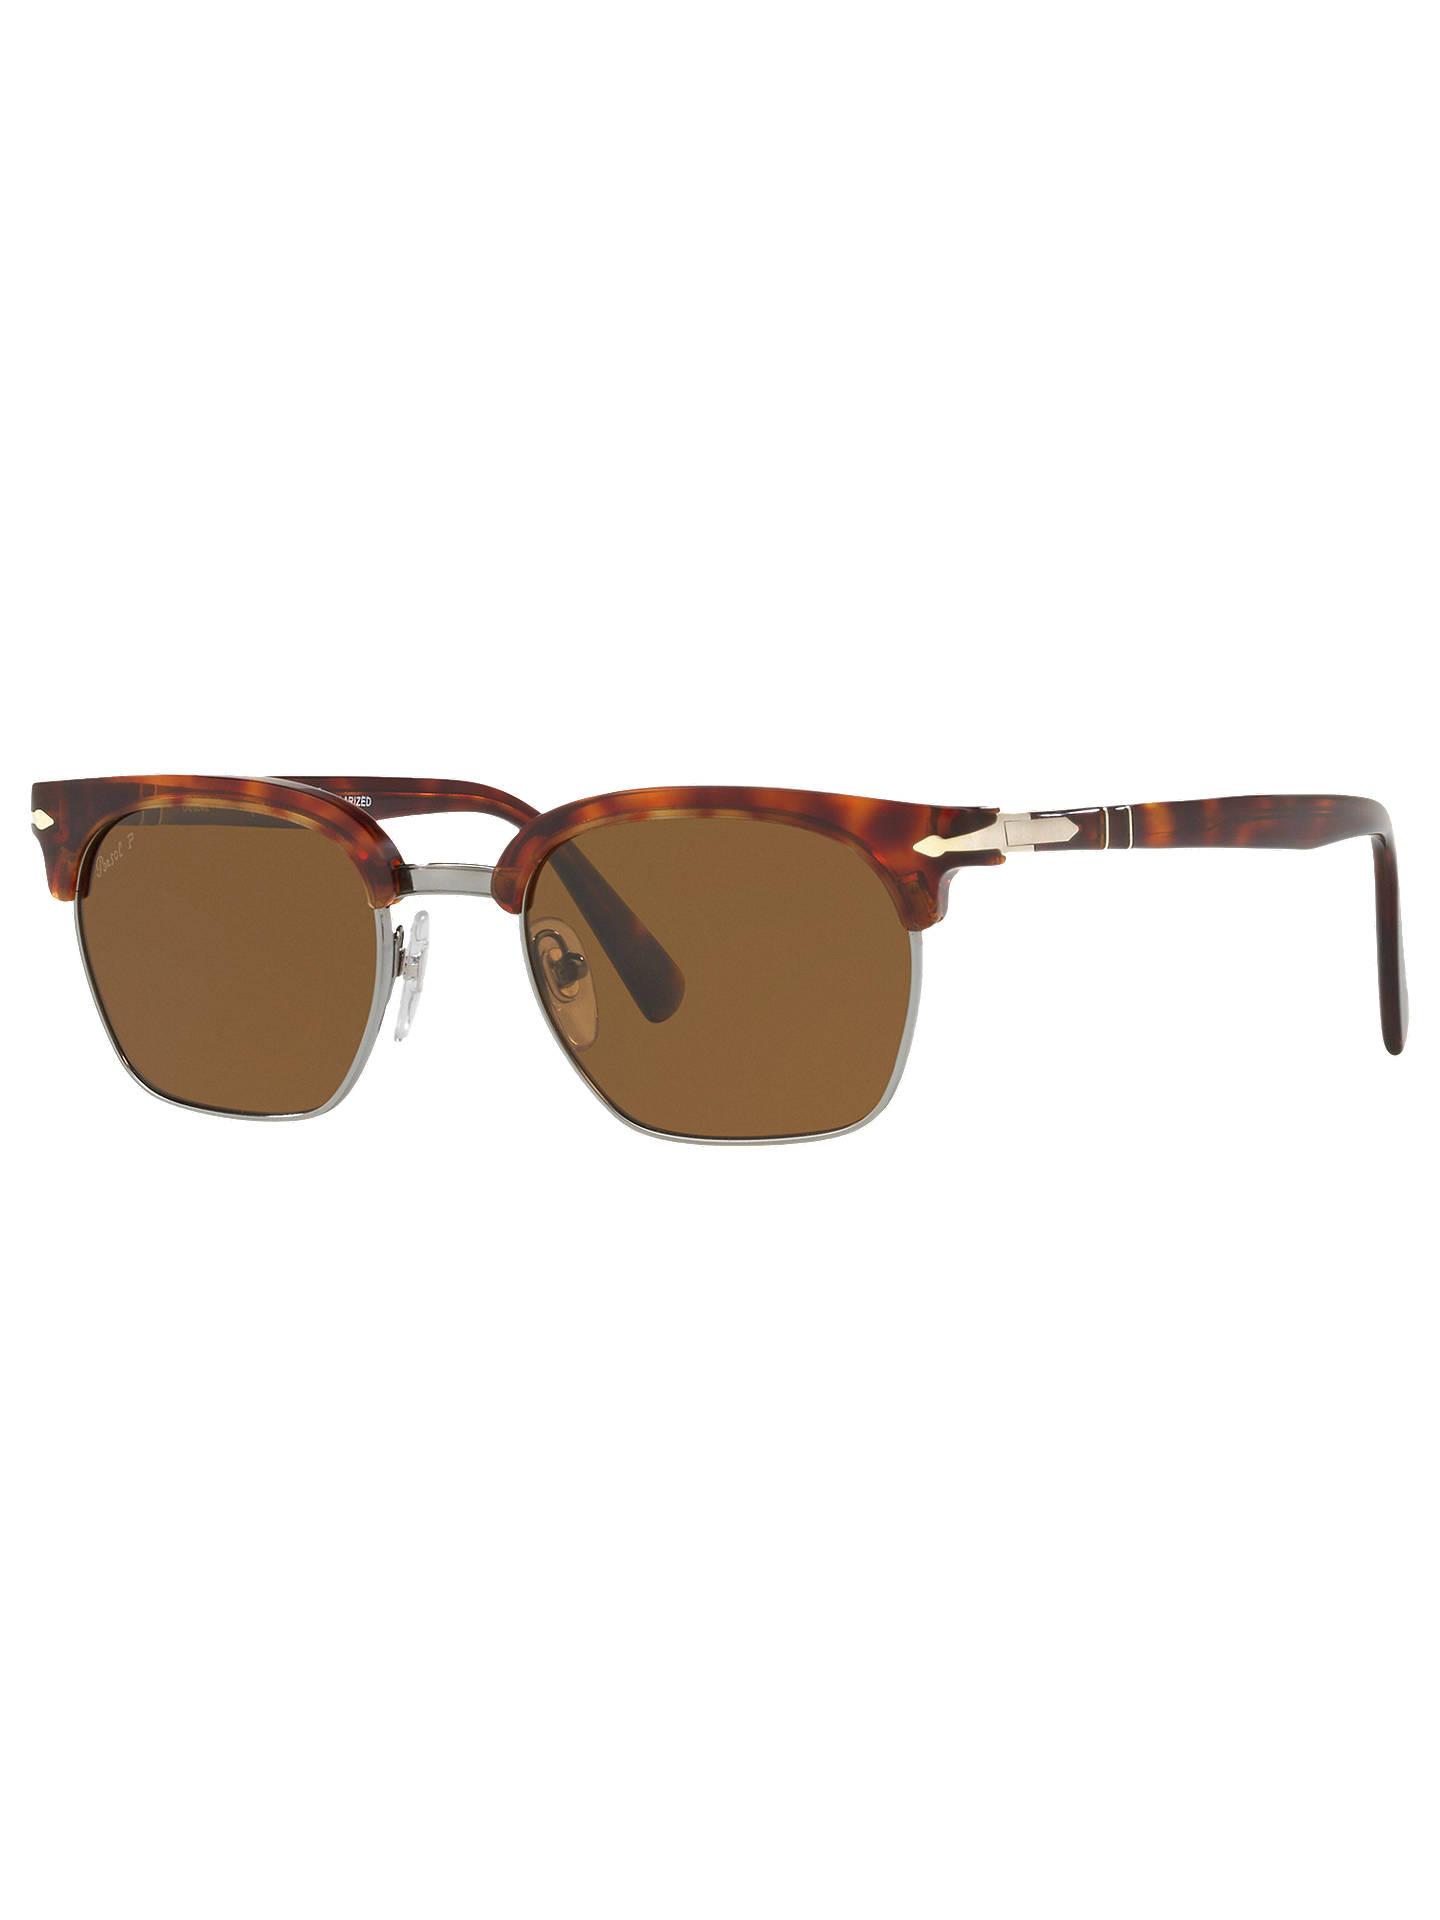 00e23d521ff9d Persol PO3199S Polarised Unisex Square Sunglasses at John Lewis ...